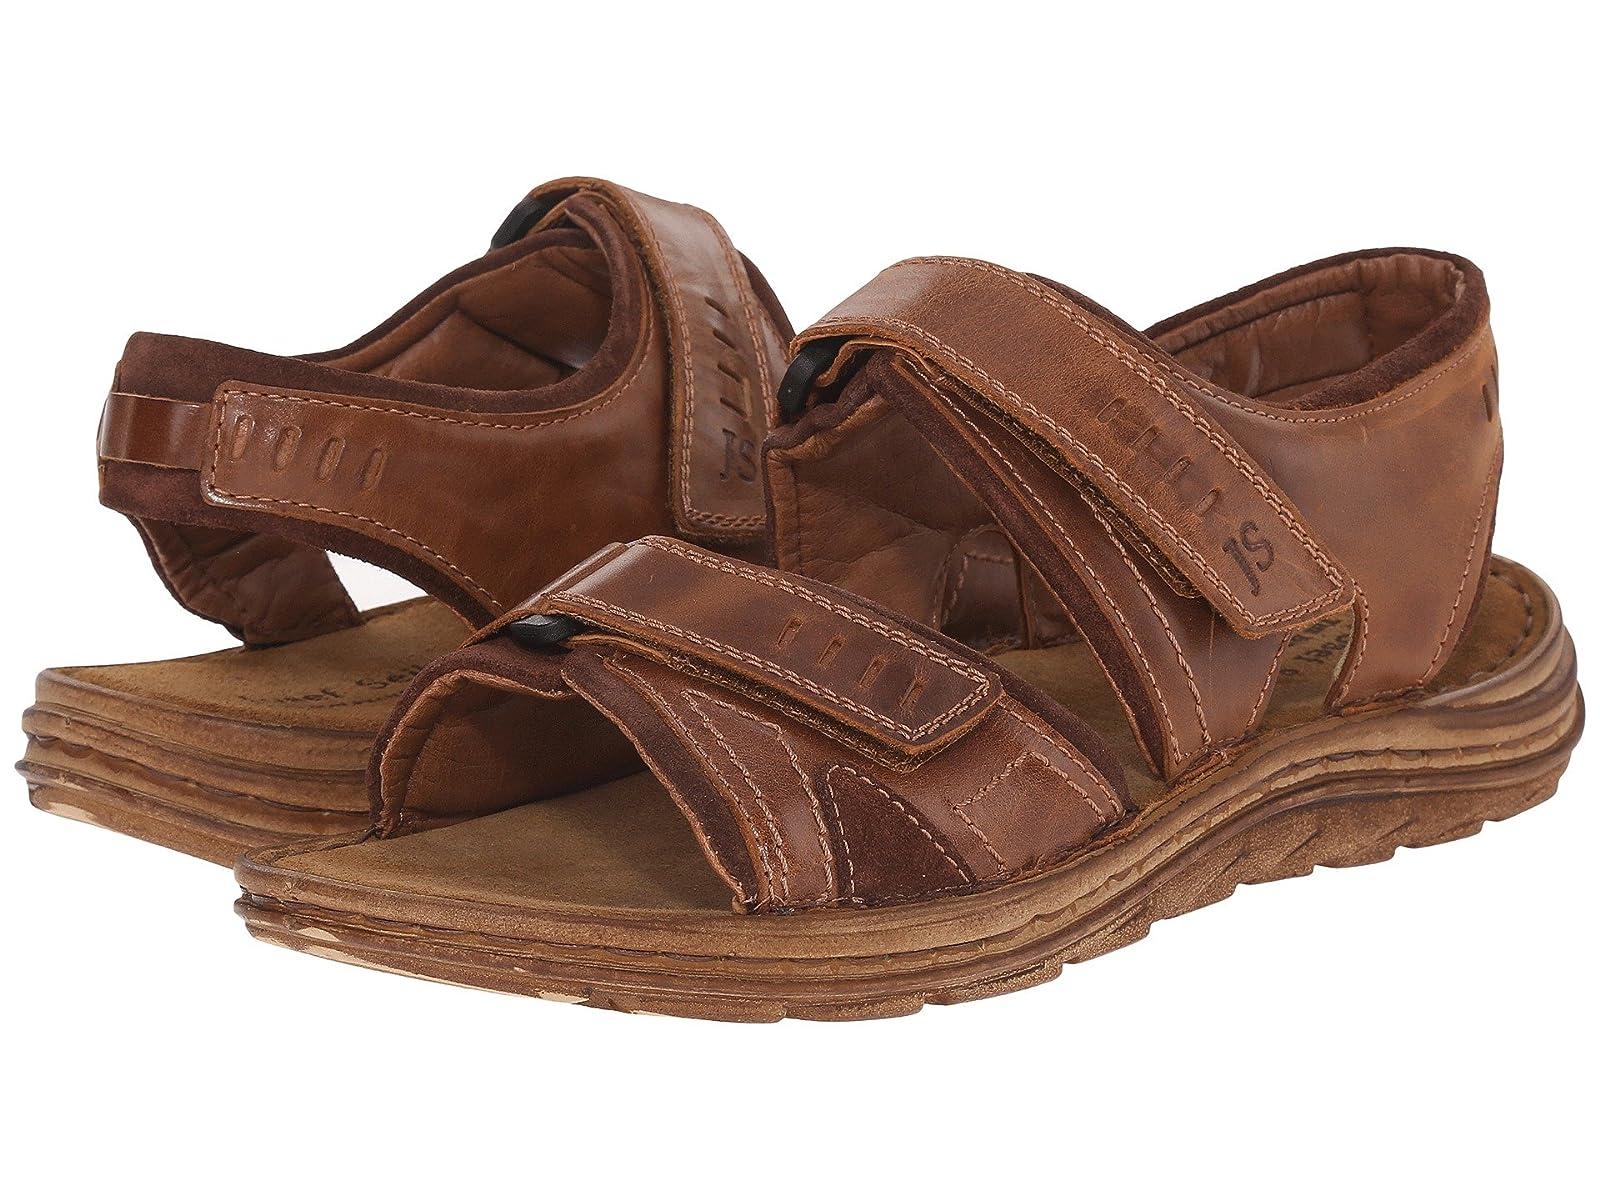 Josef Seibel Raul 19Atmospheric grades have affordable shoes